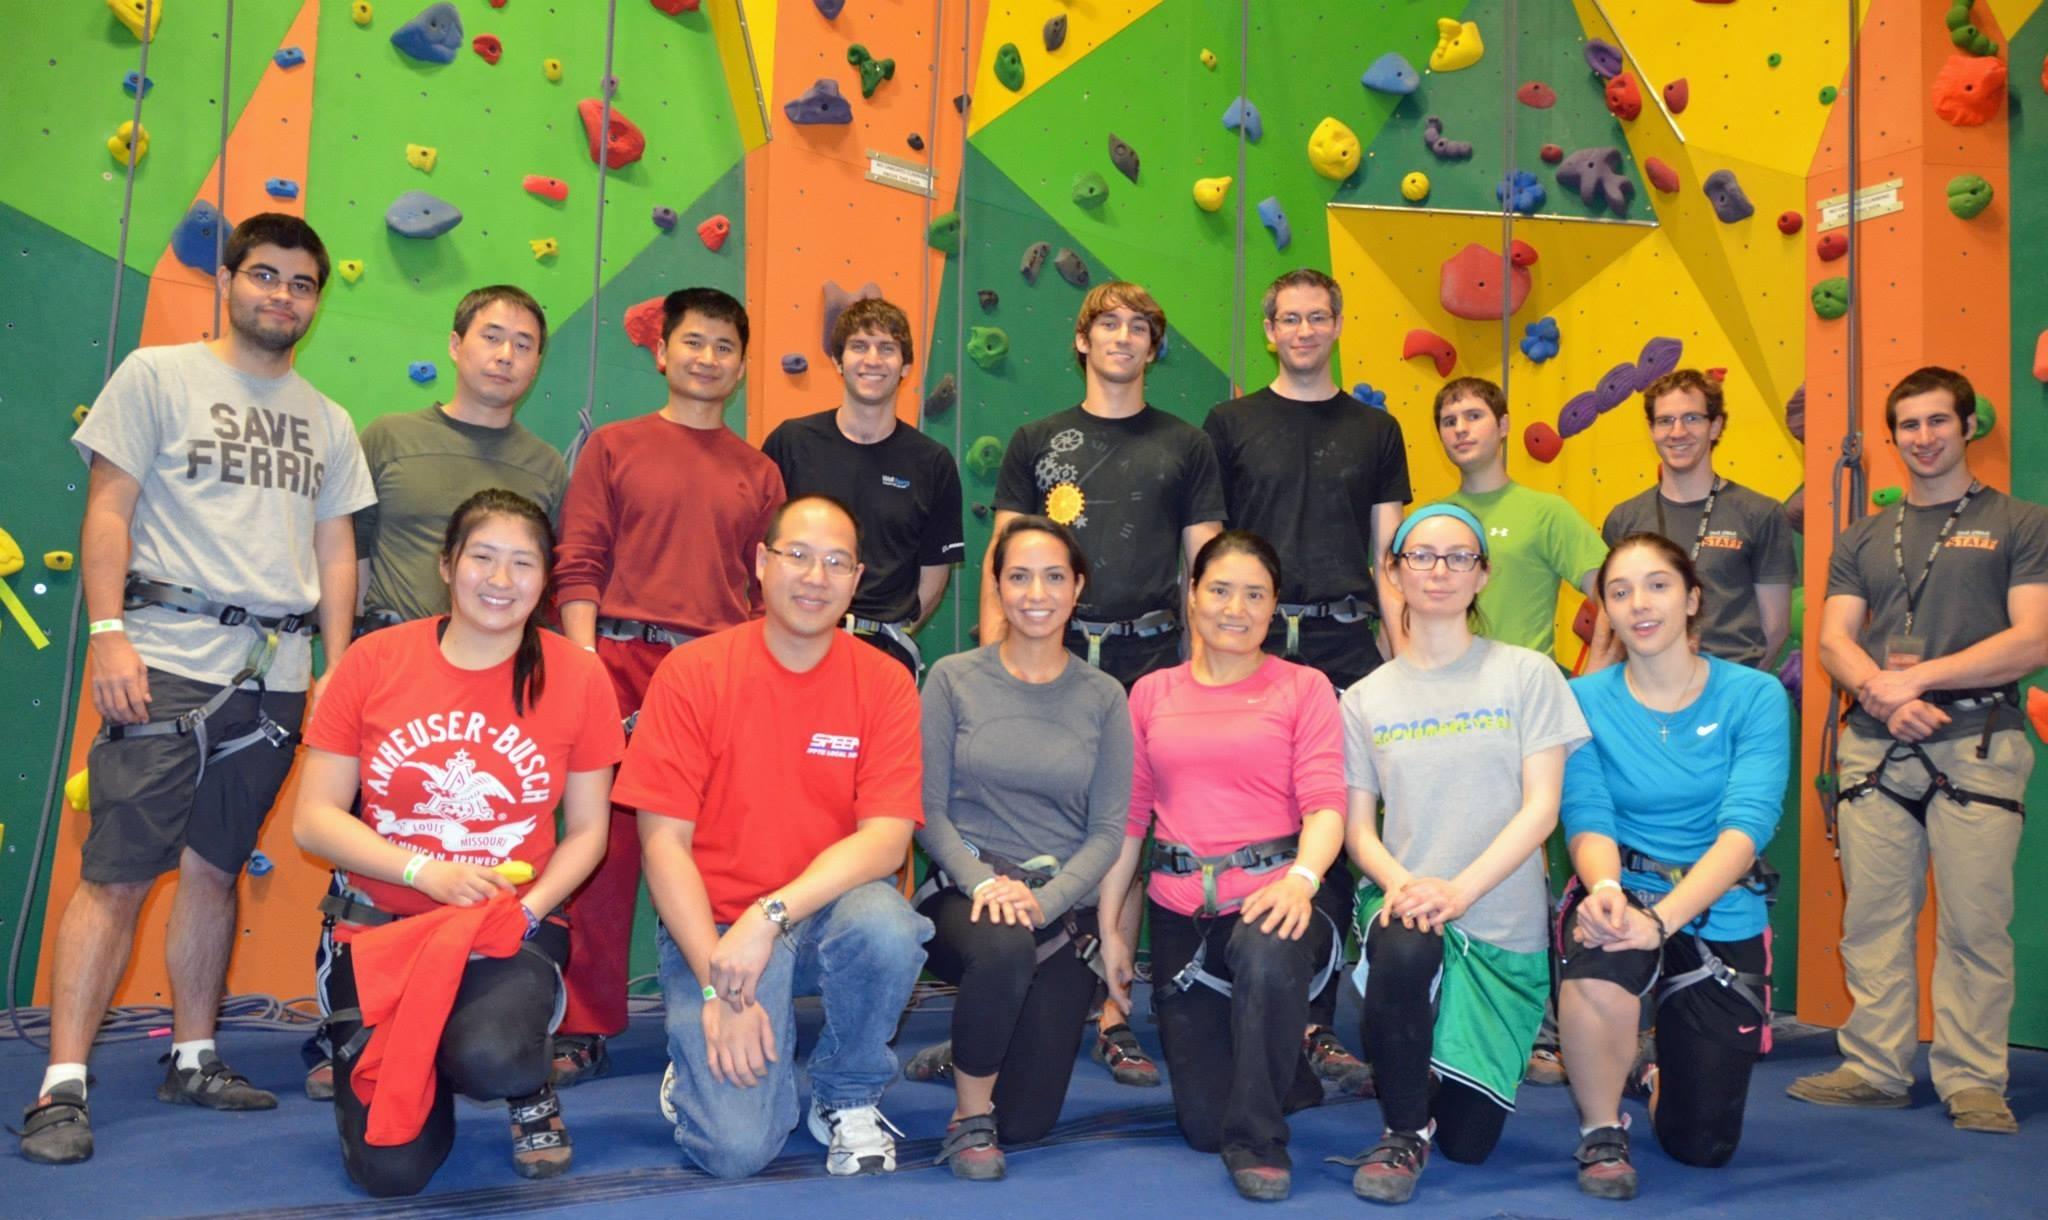 SPEEA rock climbing group photo.jpg